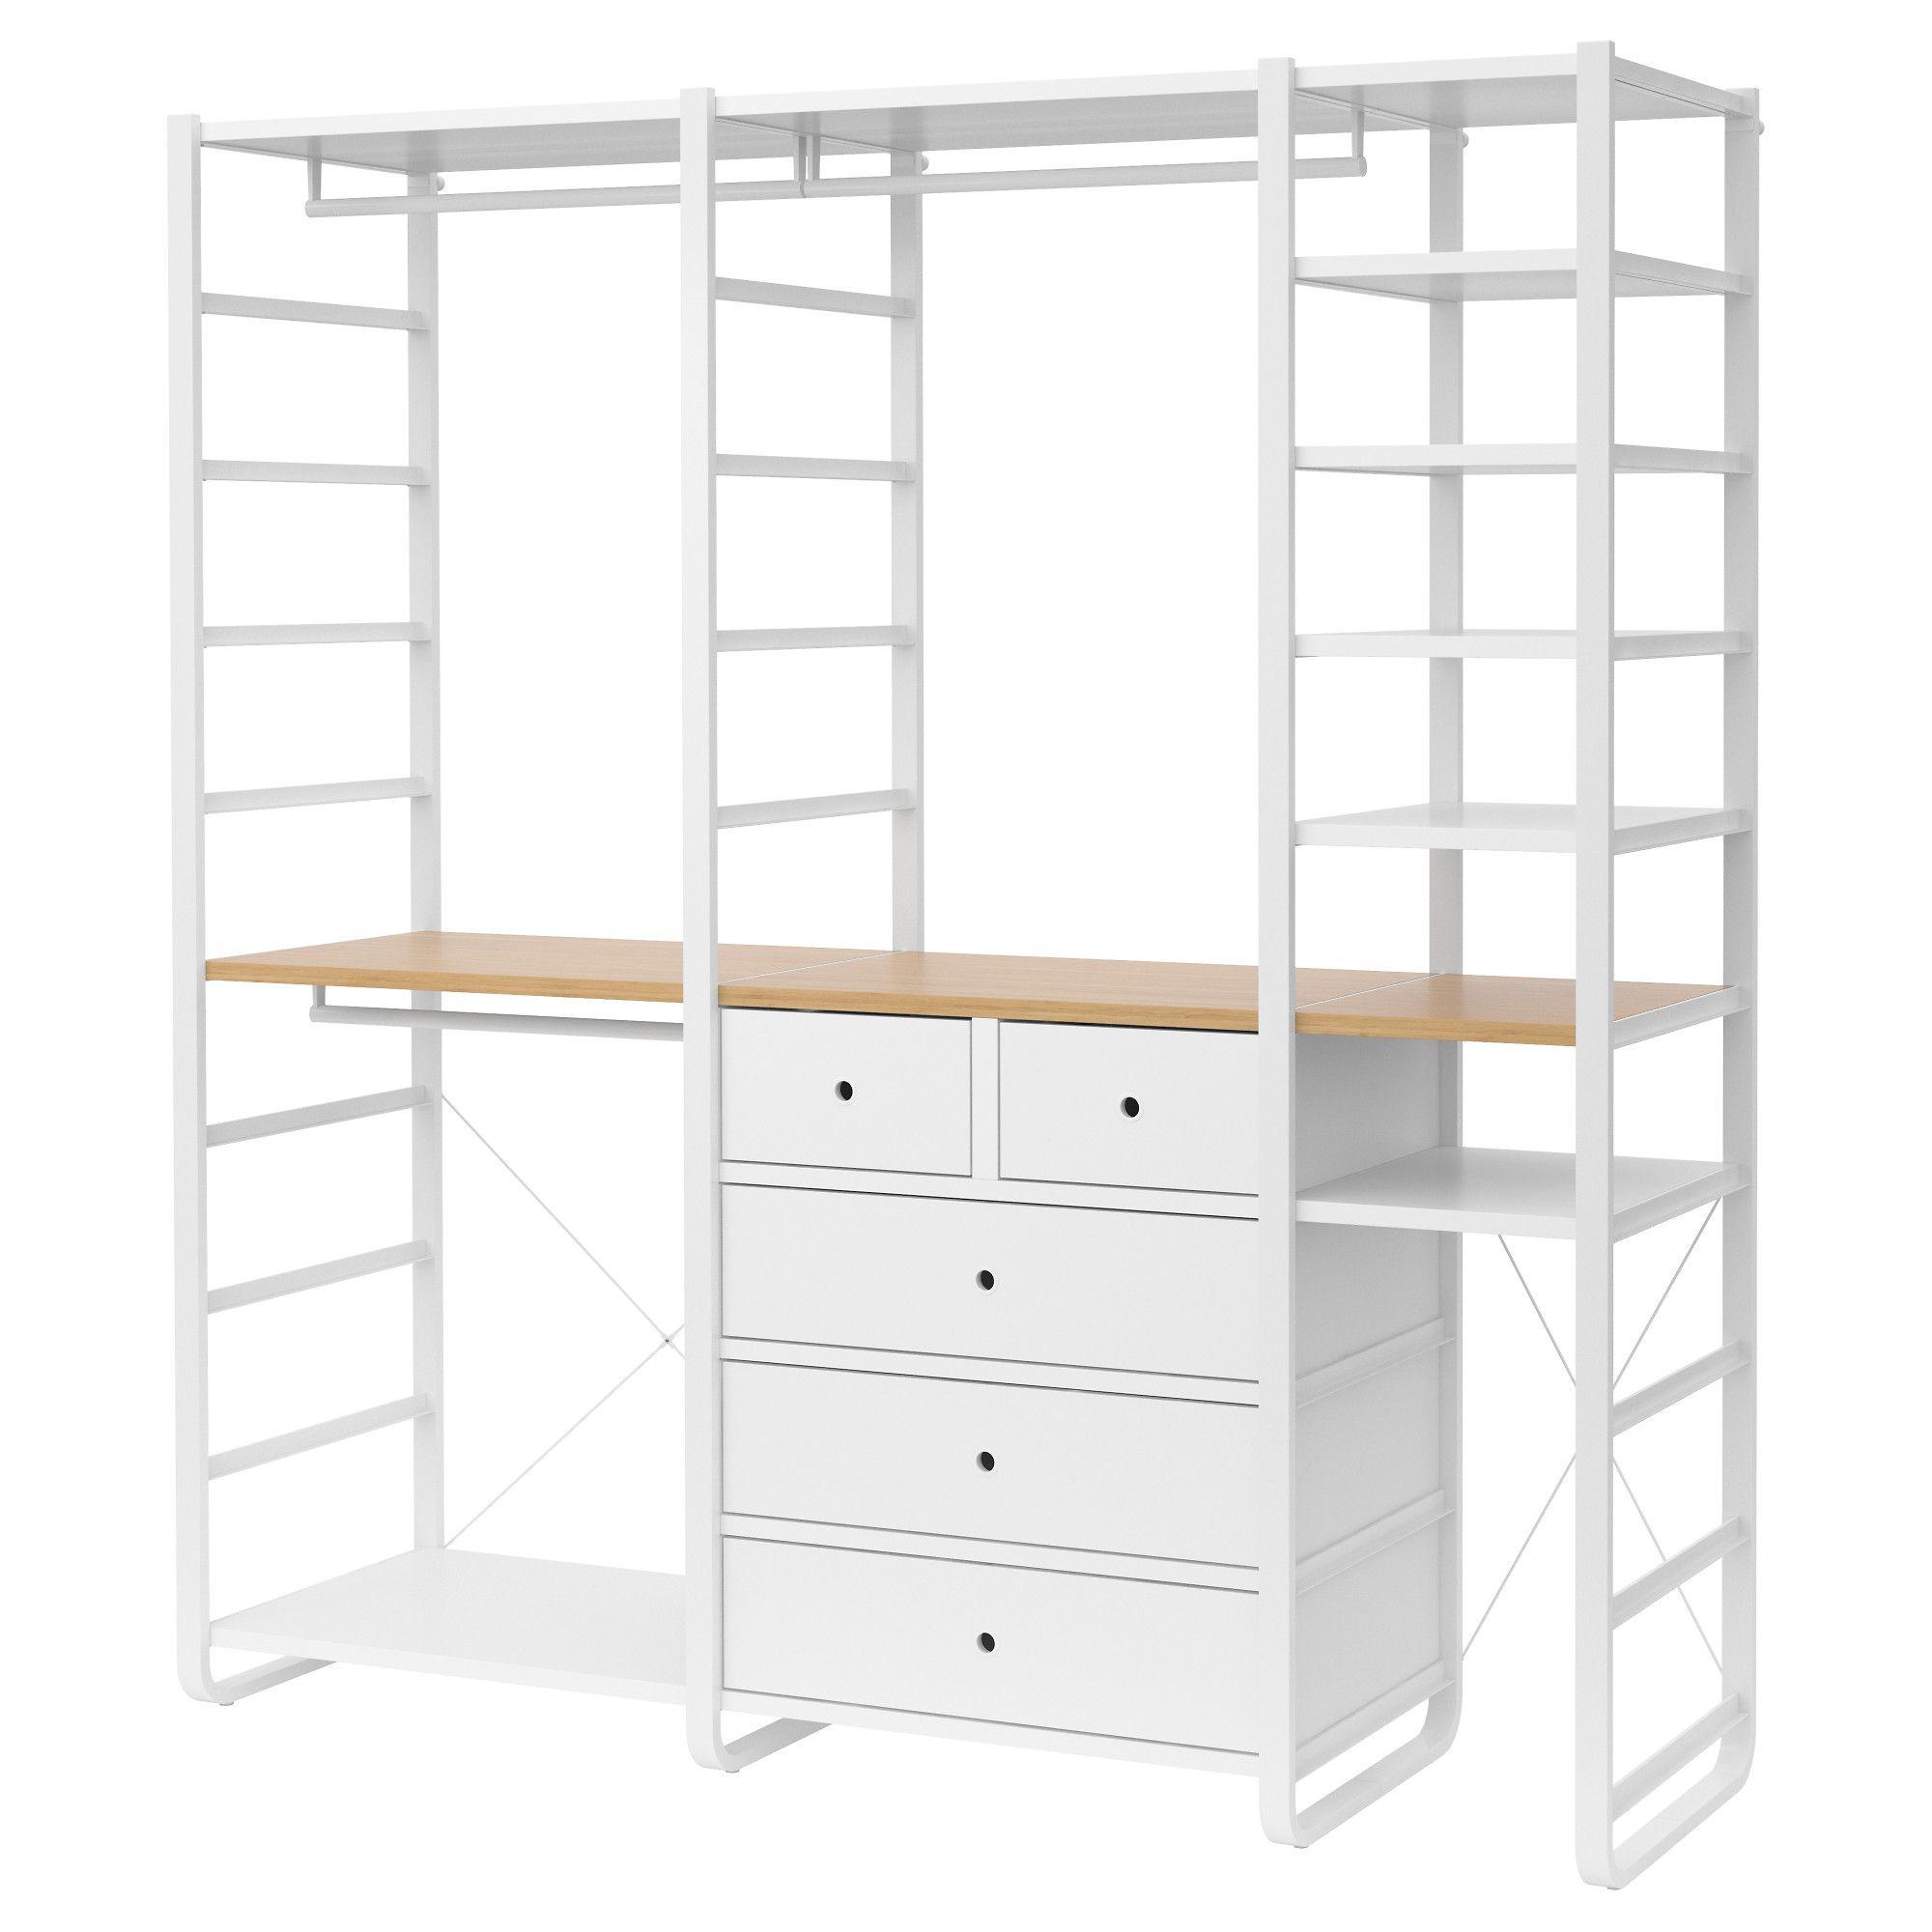 Scaffali Per Cabina Armadio furniture and home furnishings | lavanderie moderne, idee